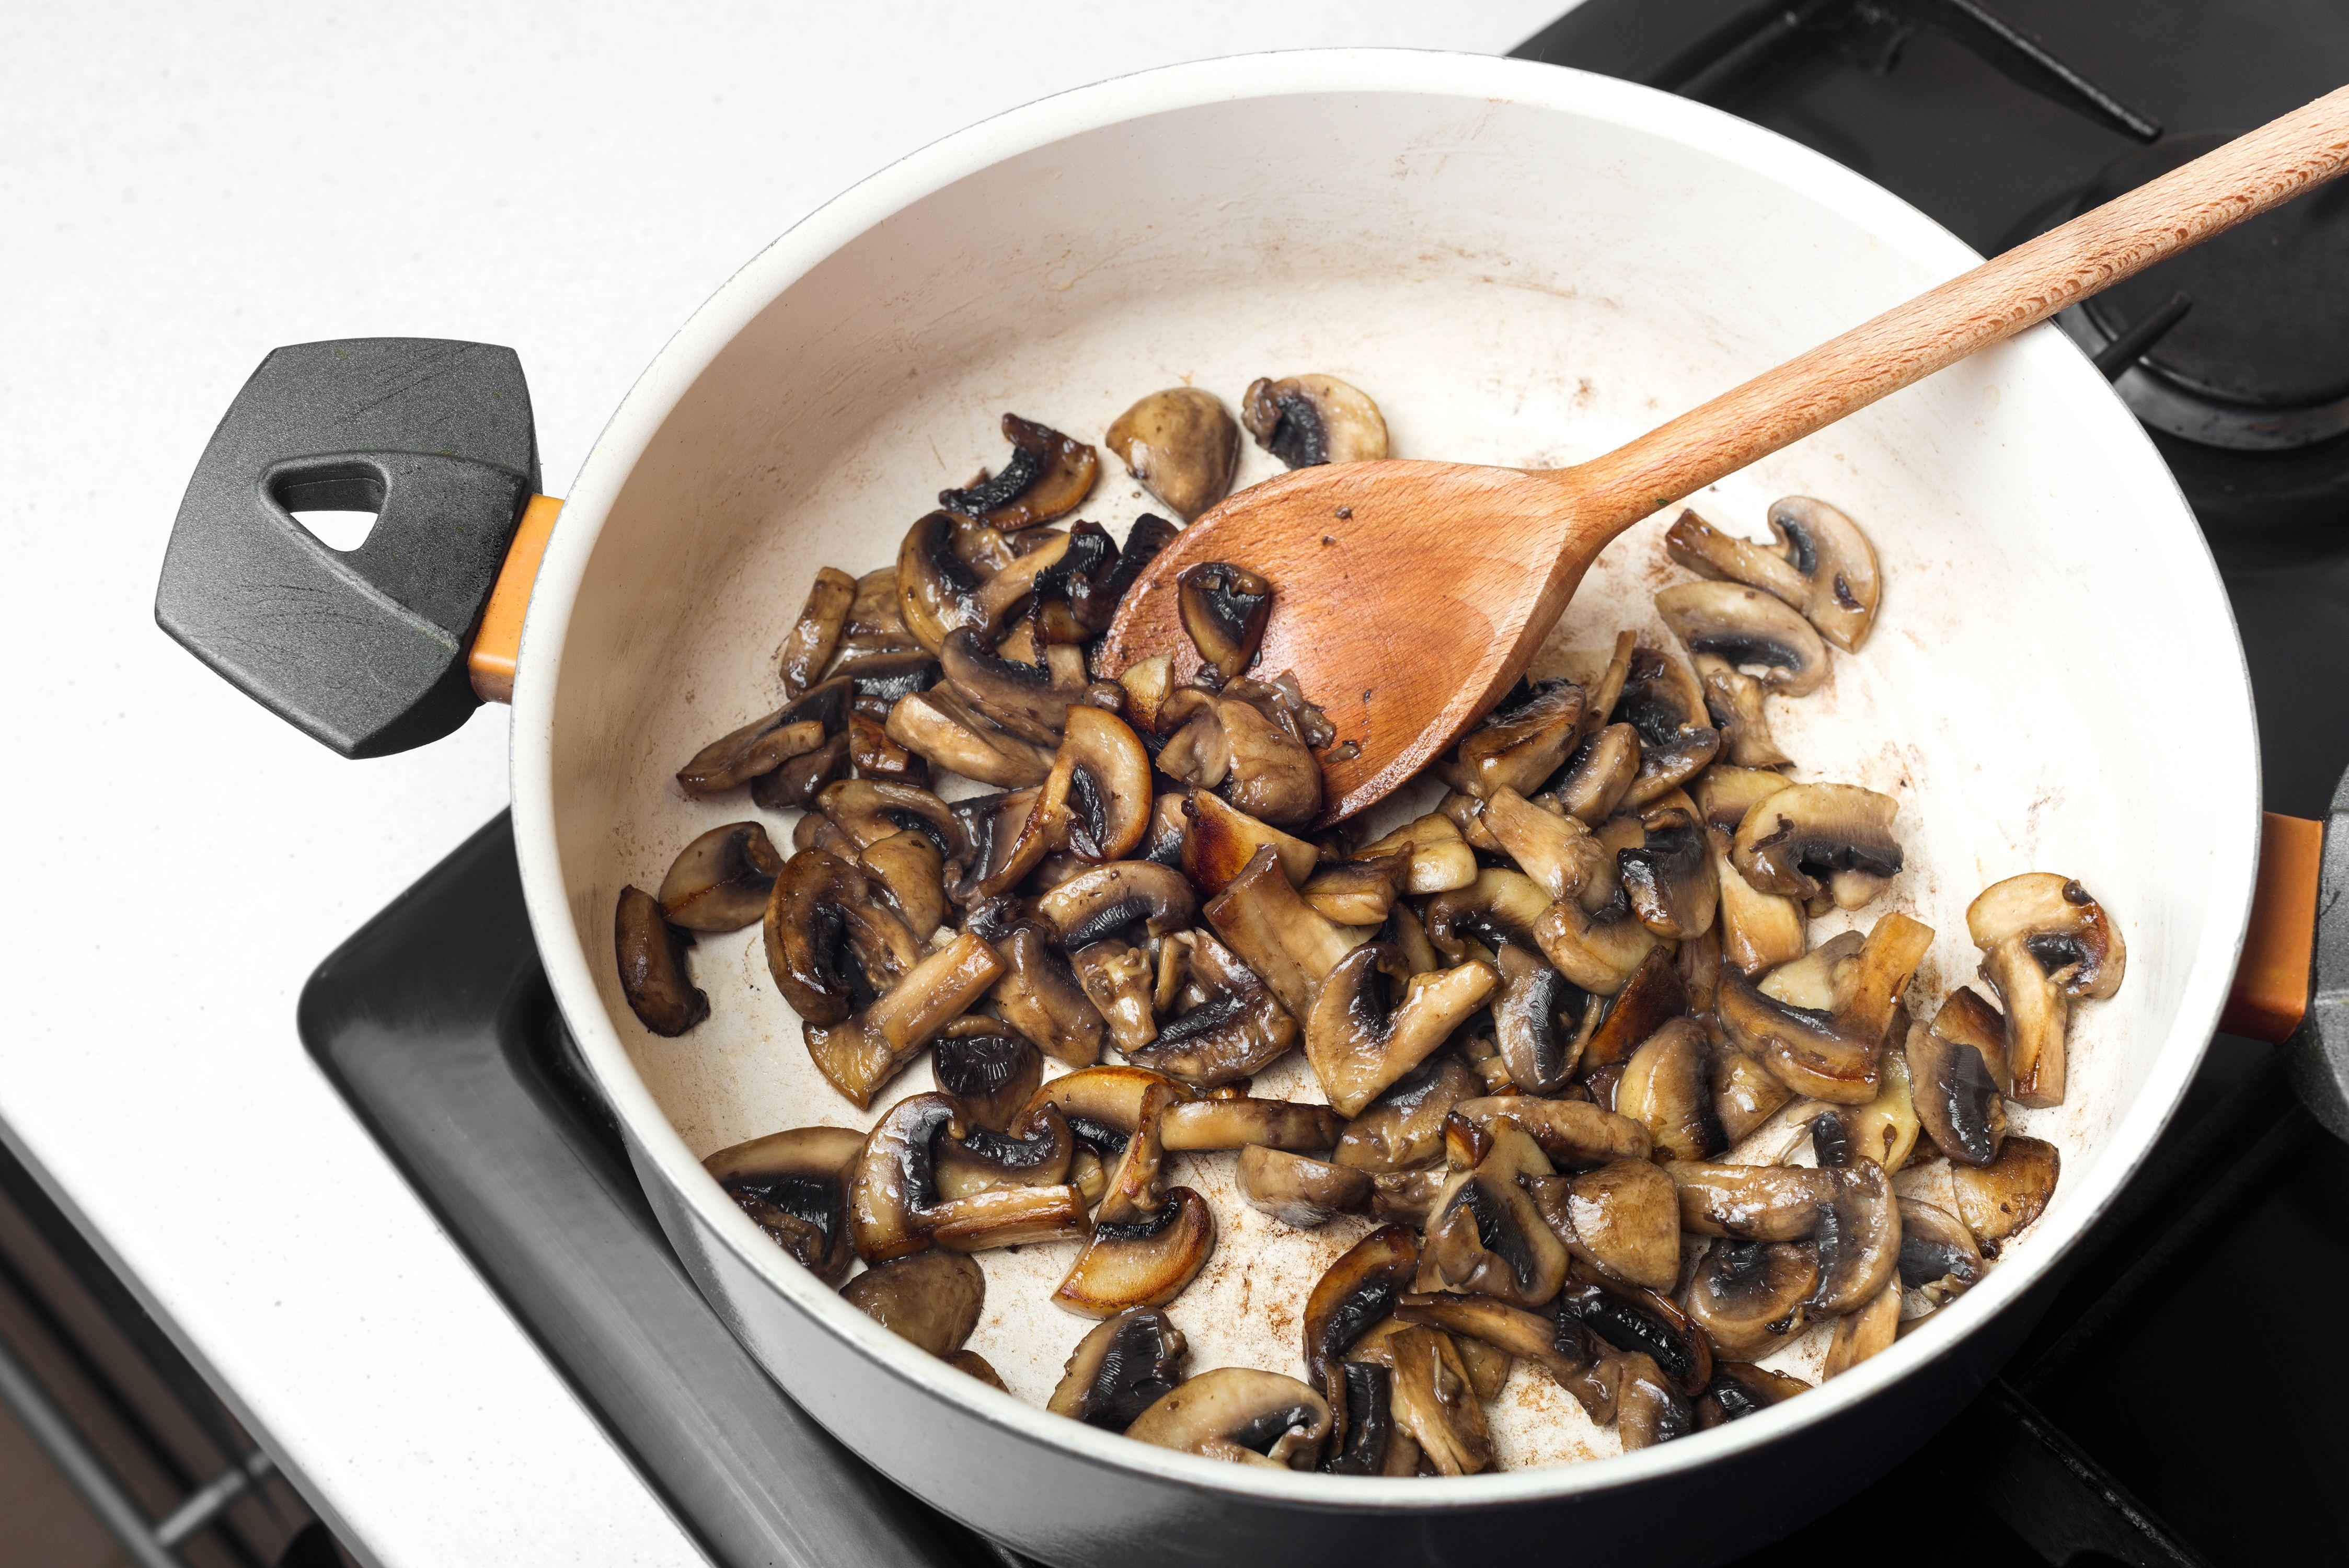 Cook mushrooms until golden brown